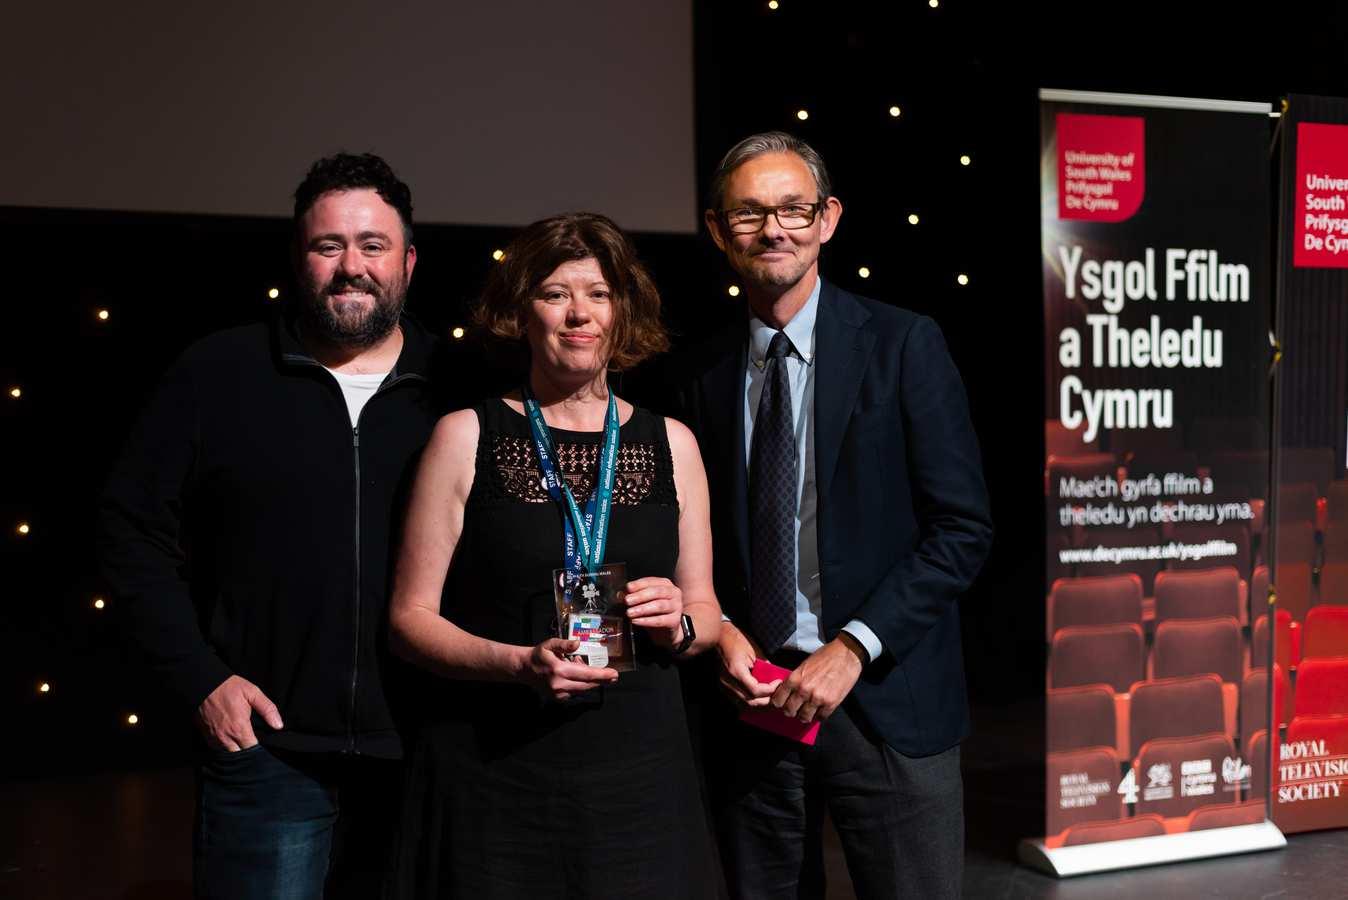 Paula Treweek, Film Ambassador Winner, with Into Film Ambassador Celyn Jones and Paul Reeve, CEO of Into Film. Neil Gibson, July 2019